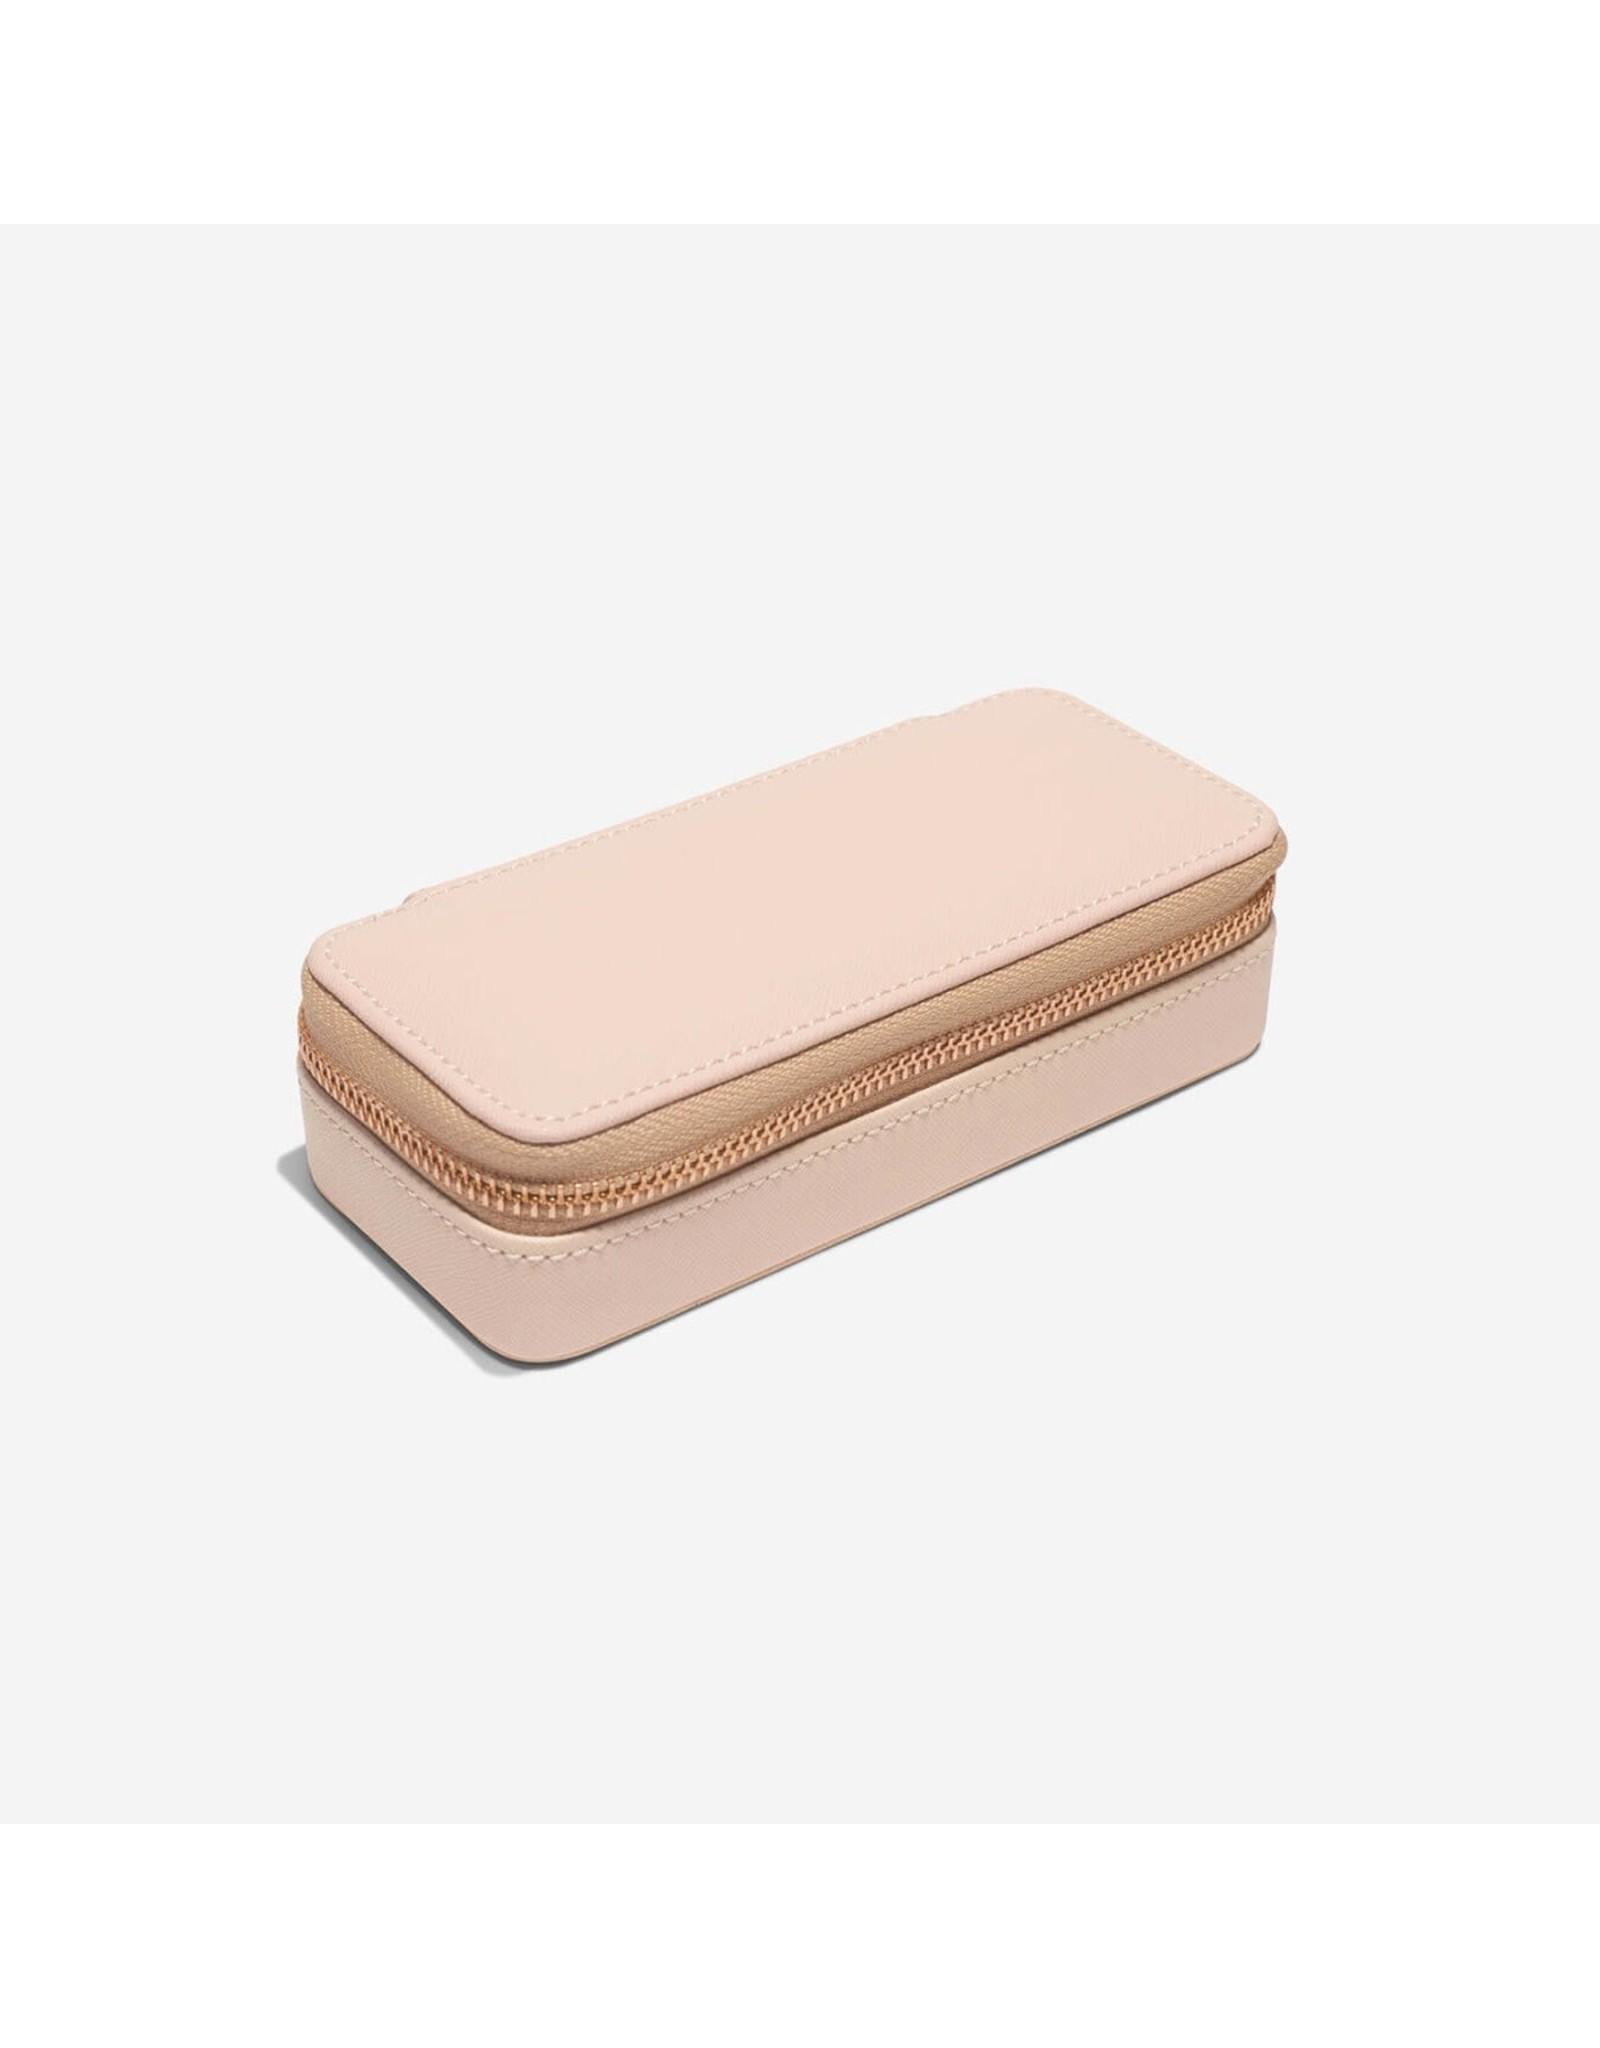 Stackers Blush - Travelbox - Mid-size